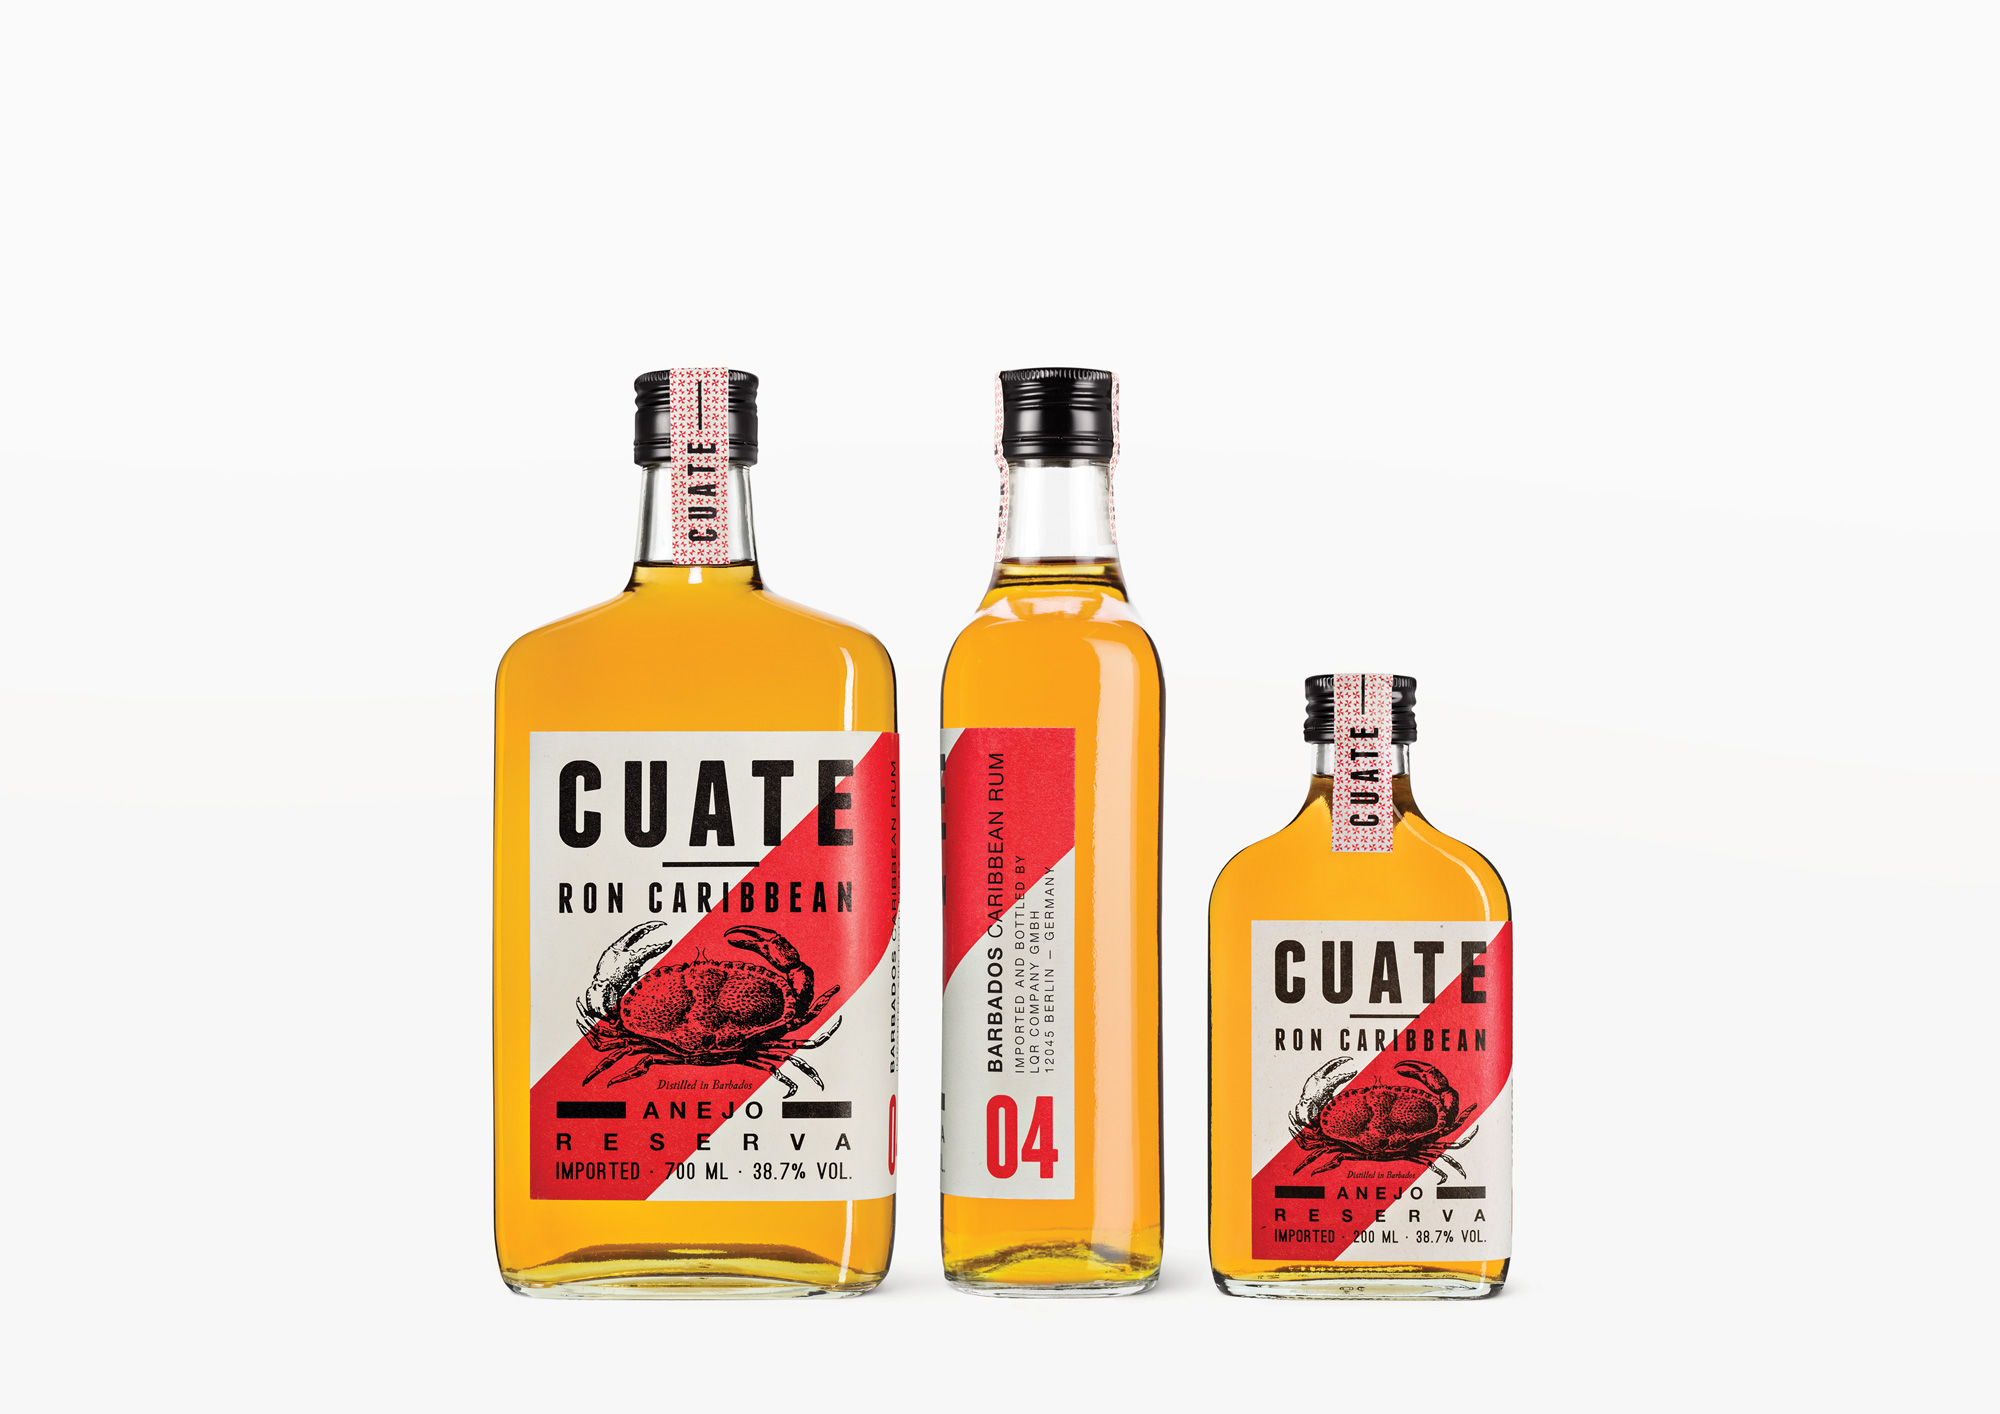 Cuate Rum 04 — Ron Caribbean